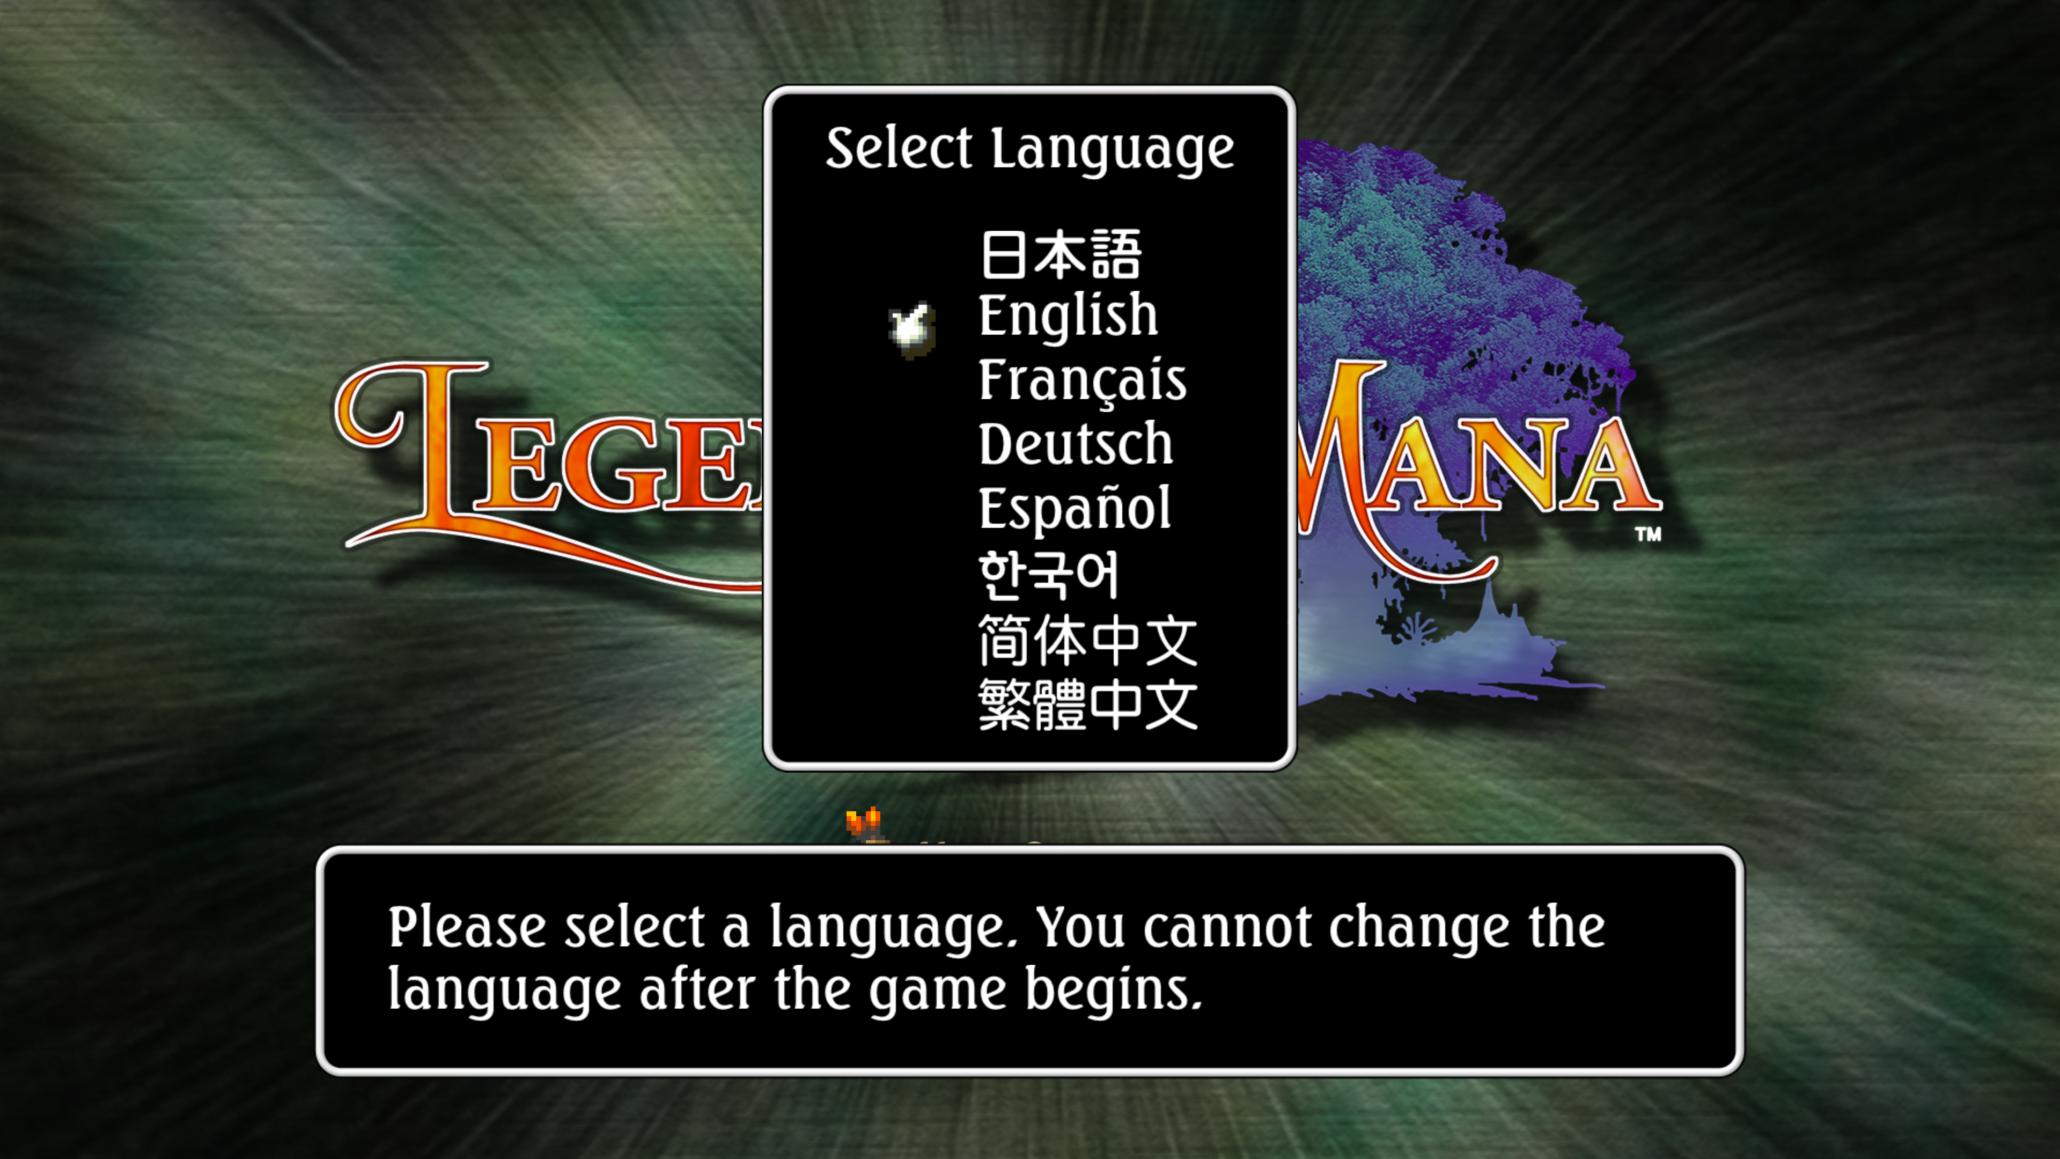 legend-of-mana-languages